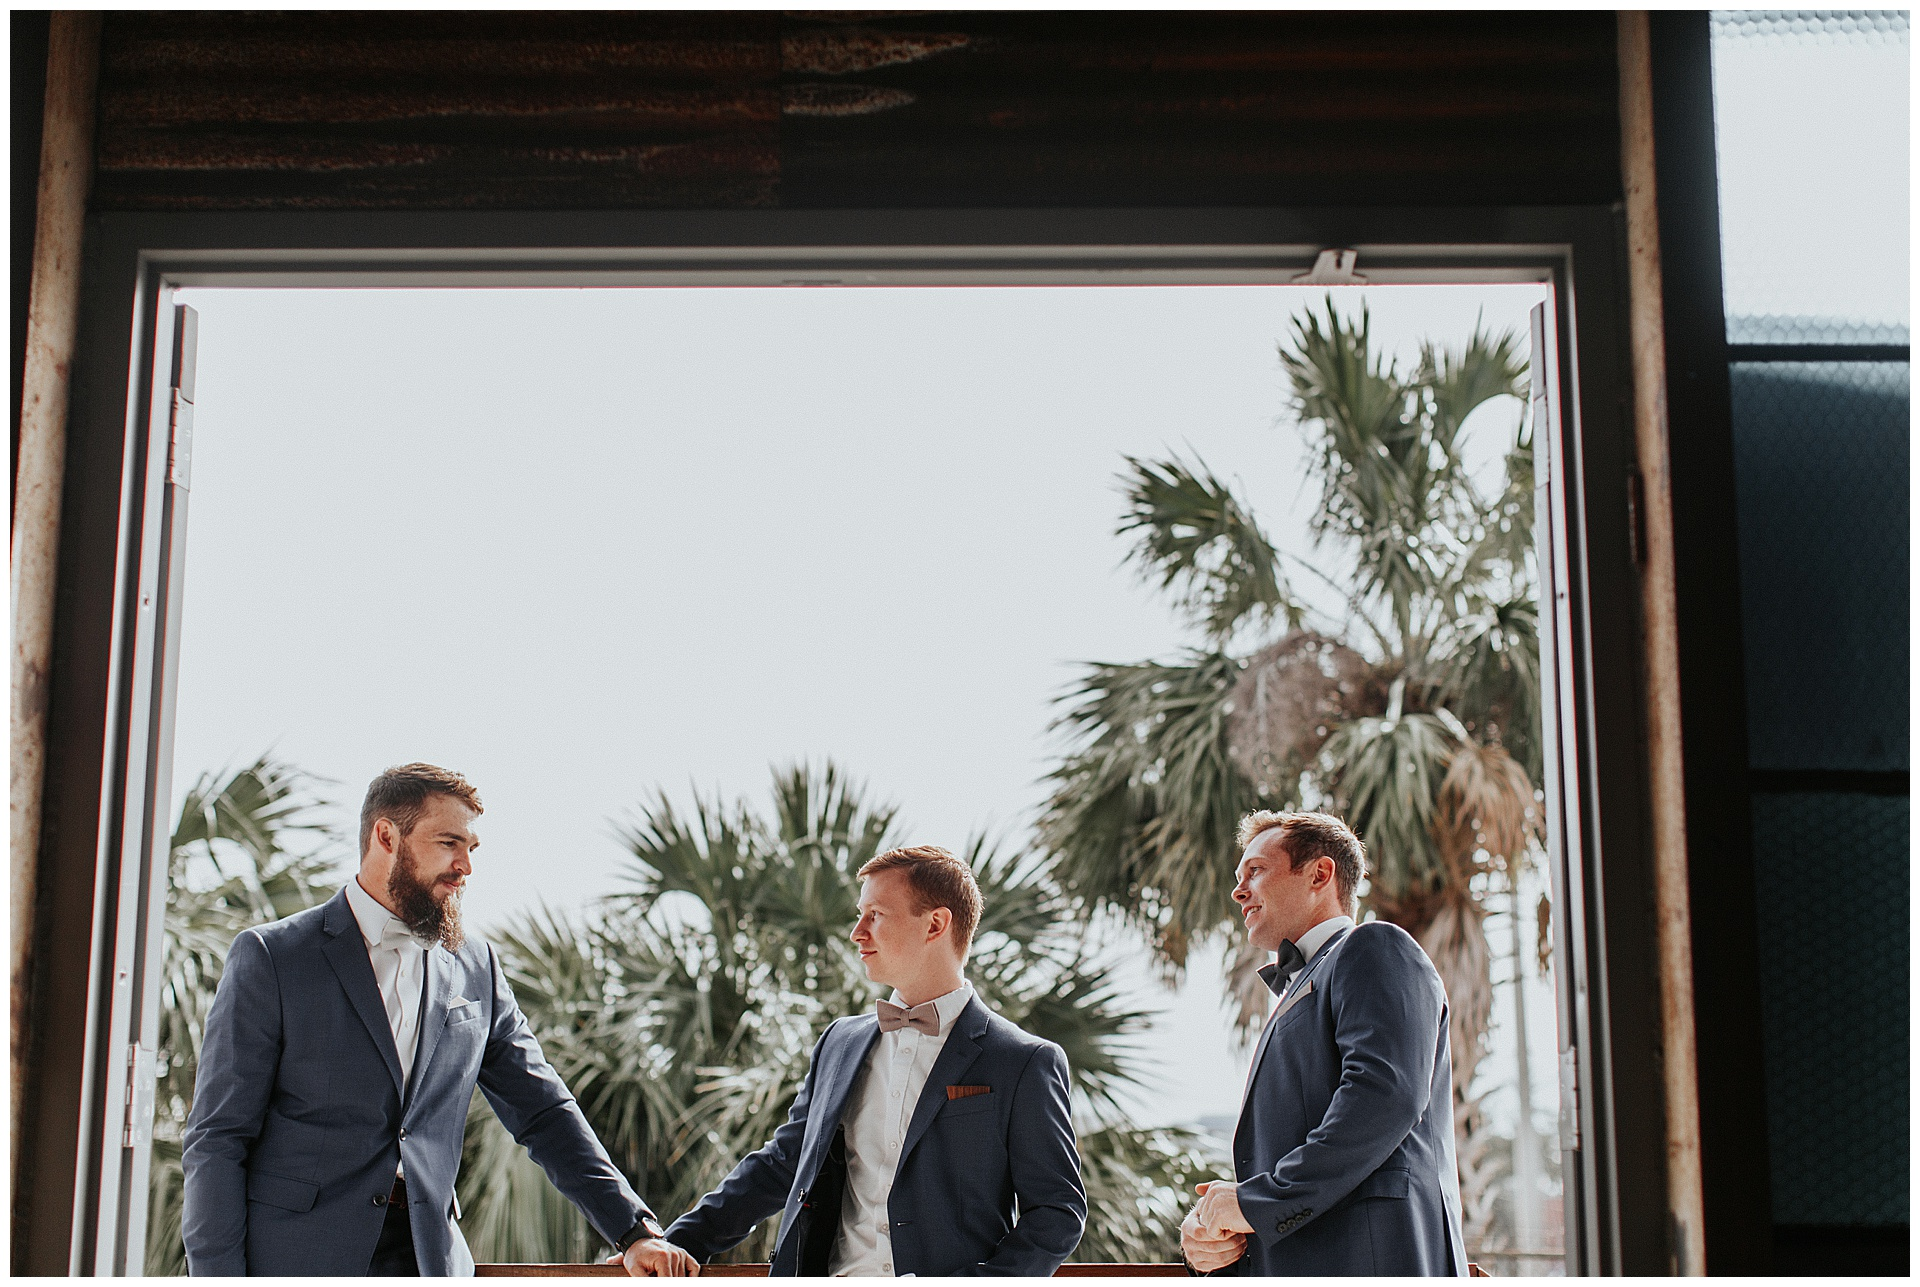 treaty oak glass factory wedding_mia dimare photography9.jpg